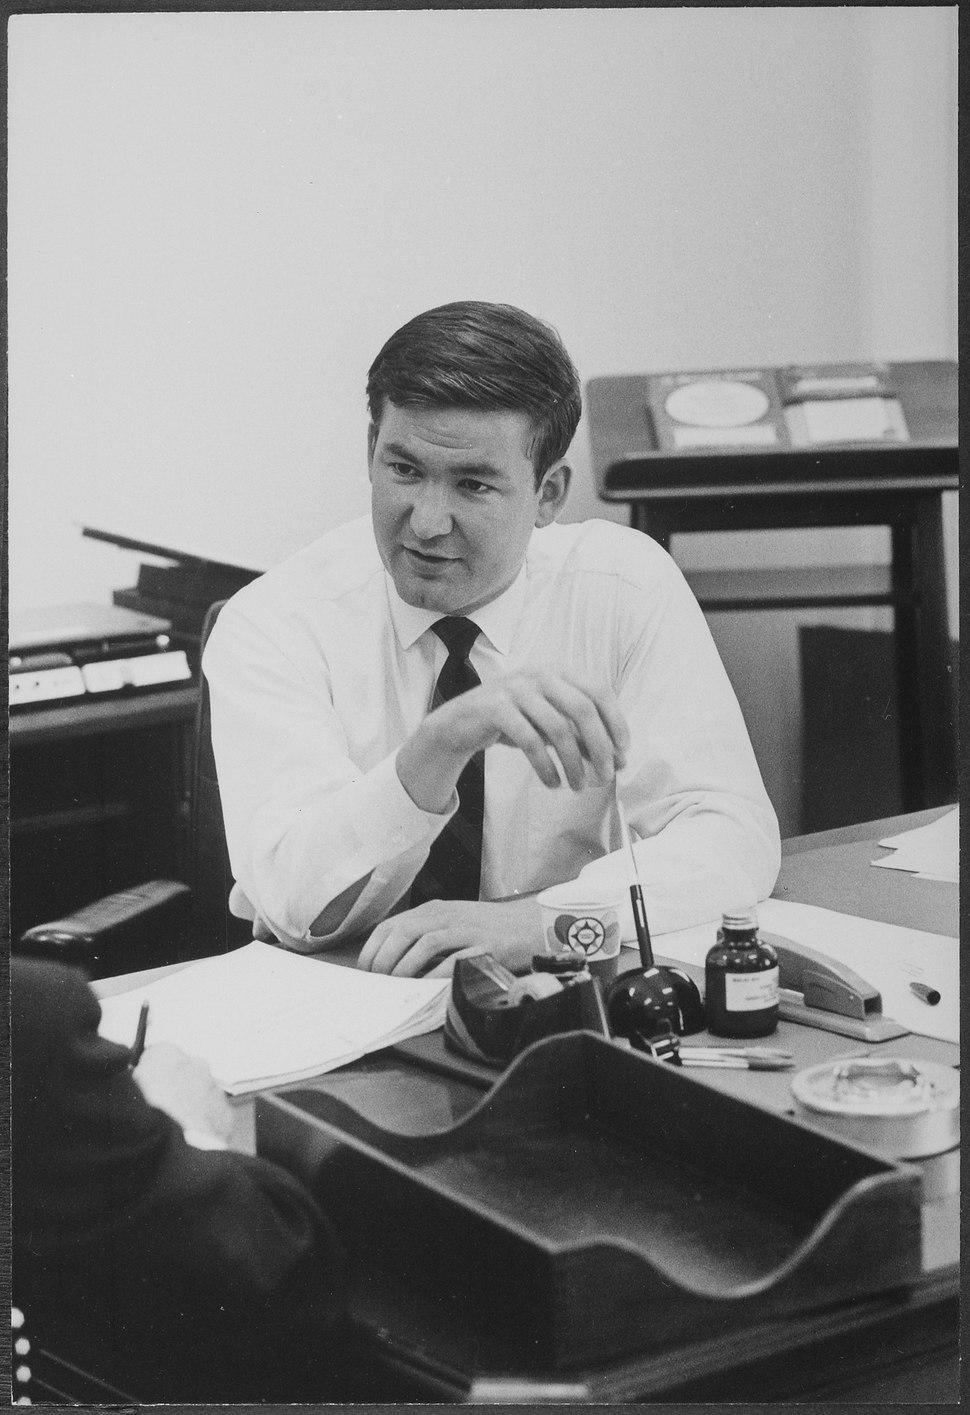 Portrait of Patrick Buchanan, presidential aide - NARA - 194638